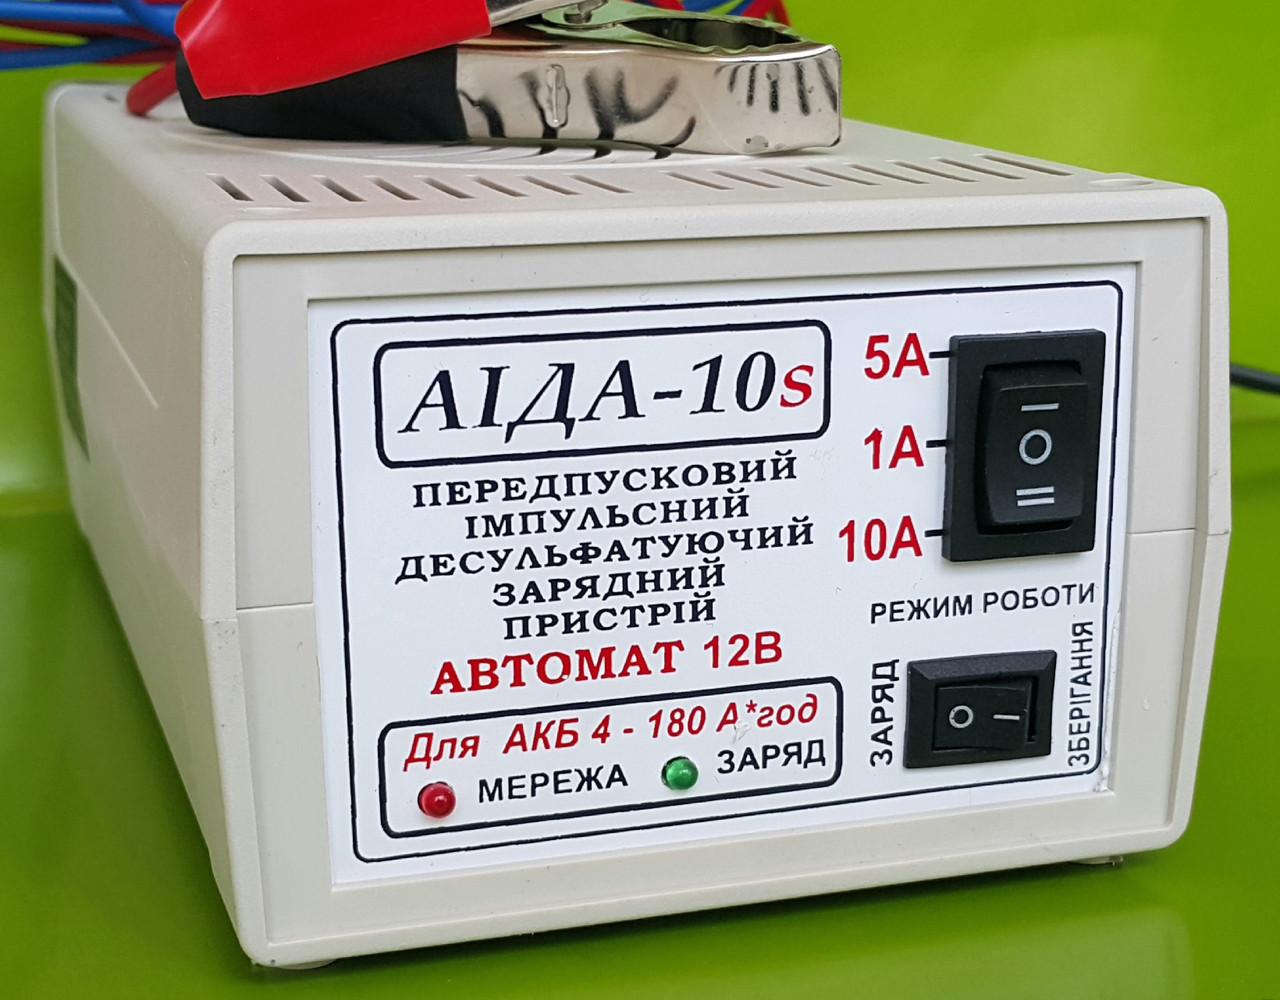 Аида 10s (super): зарядное устройство для авто аккумуляторов 4-180 Ач